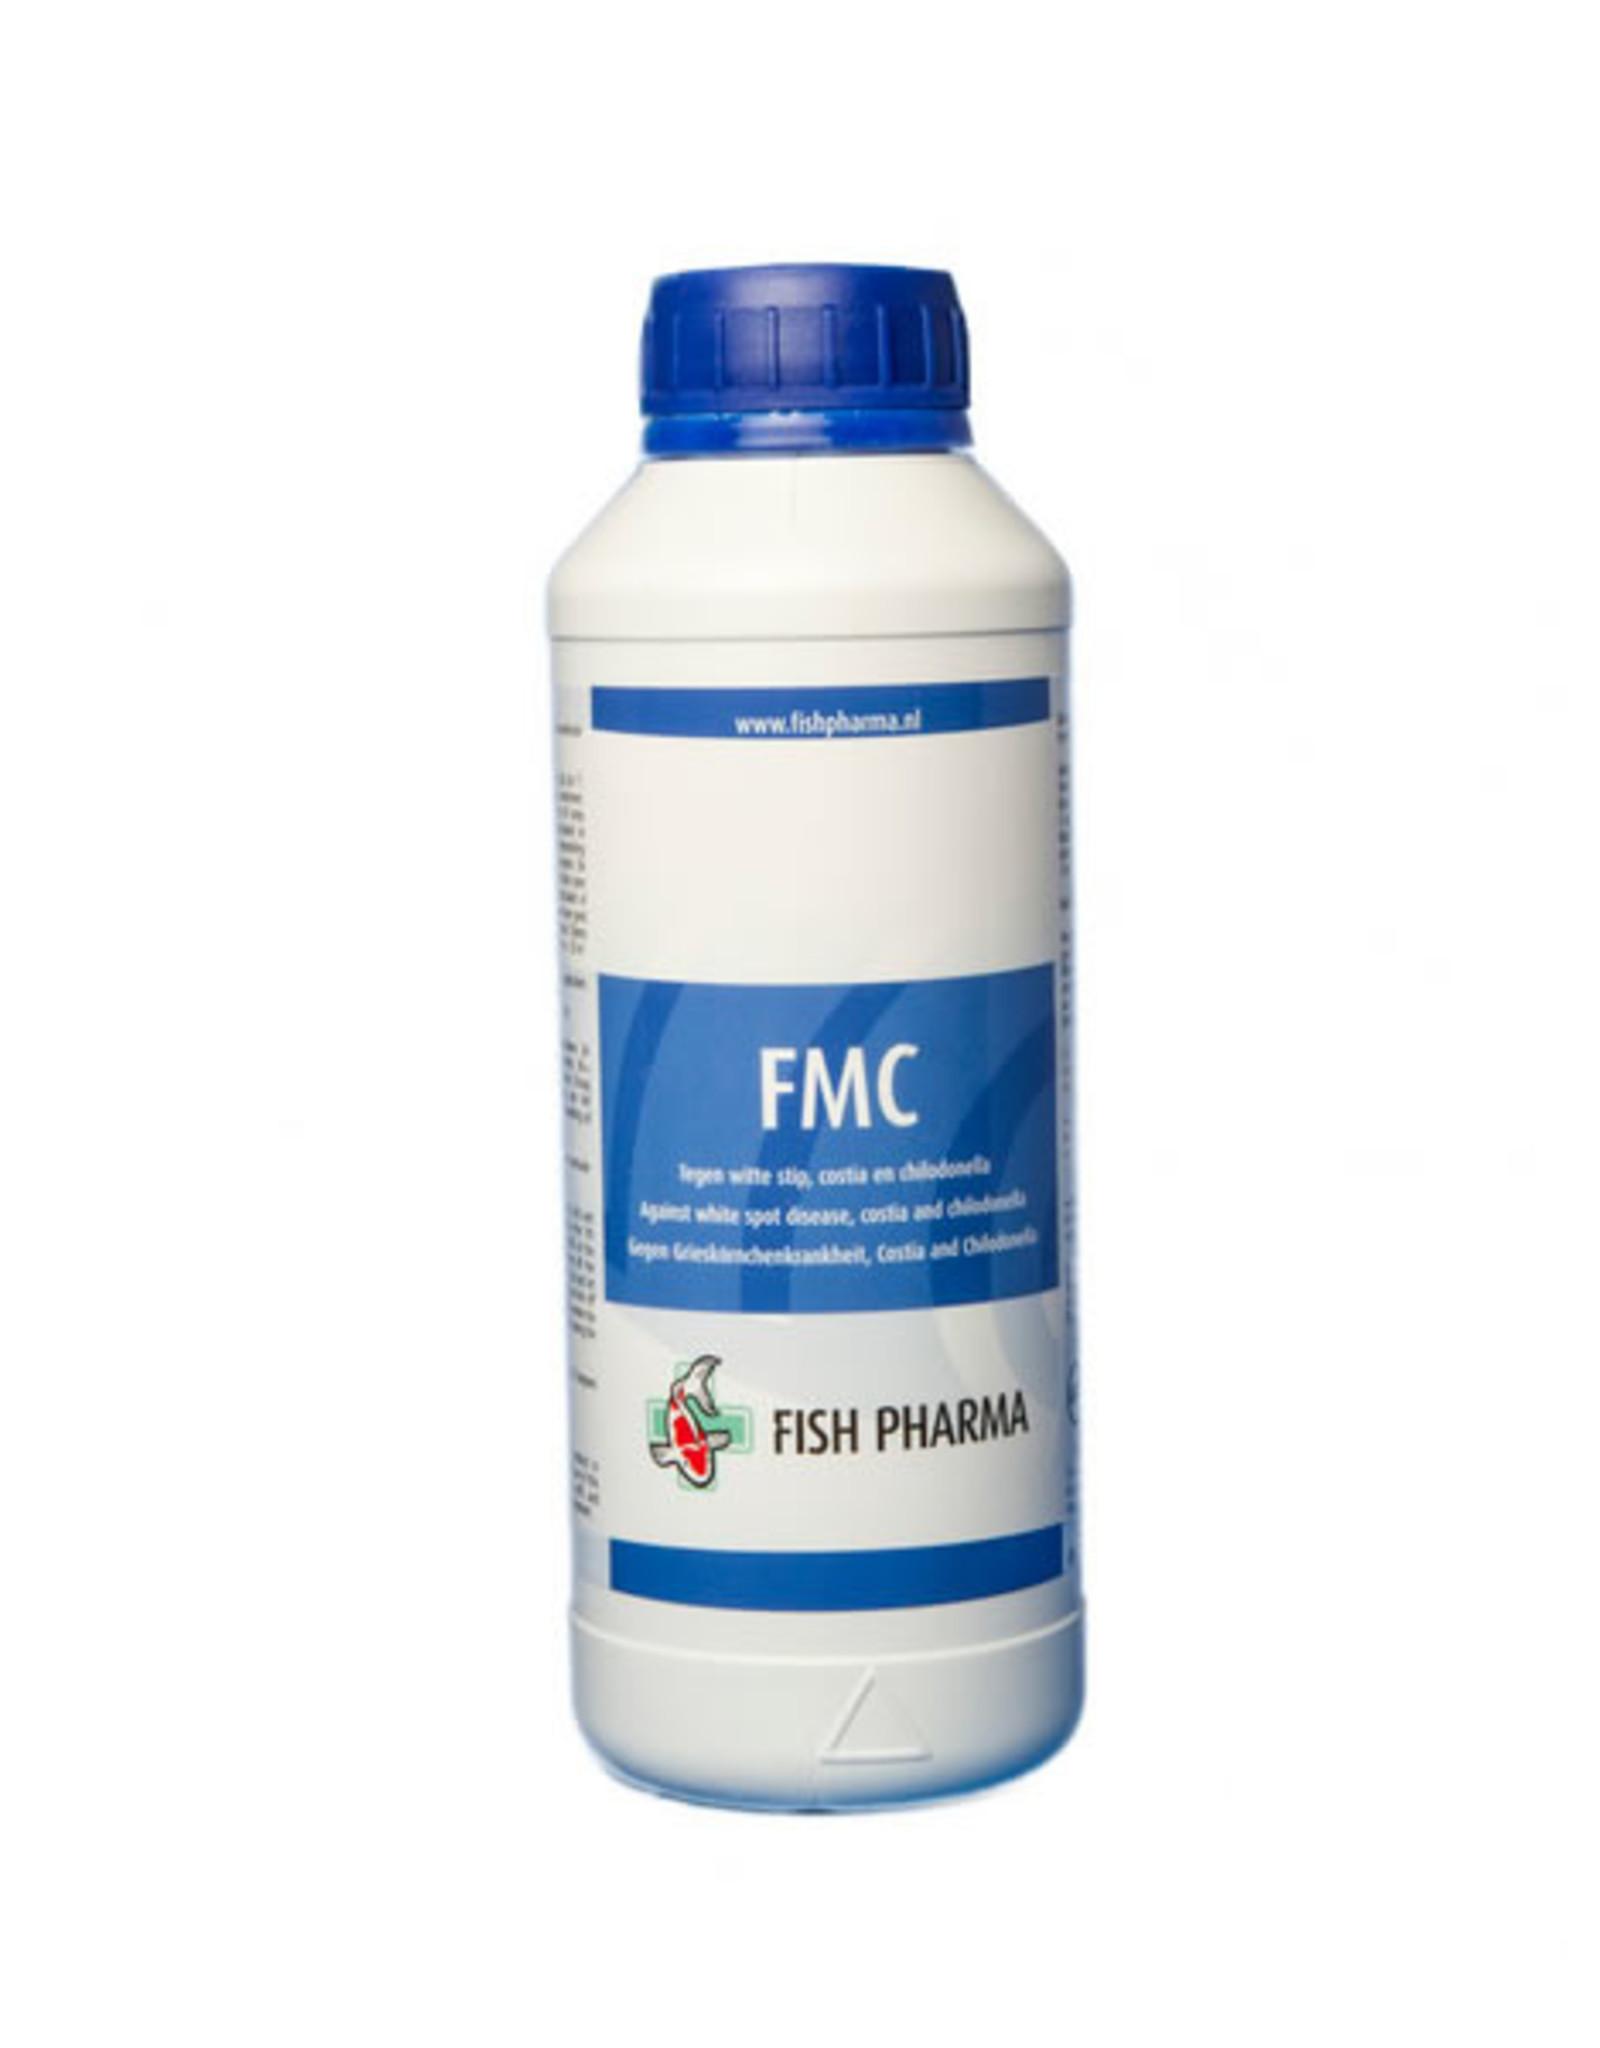 Fish Pharma FMC tegen witte stip, costia en chilodonella.